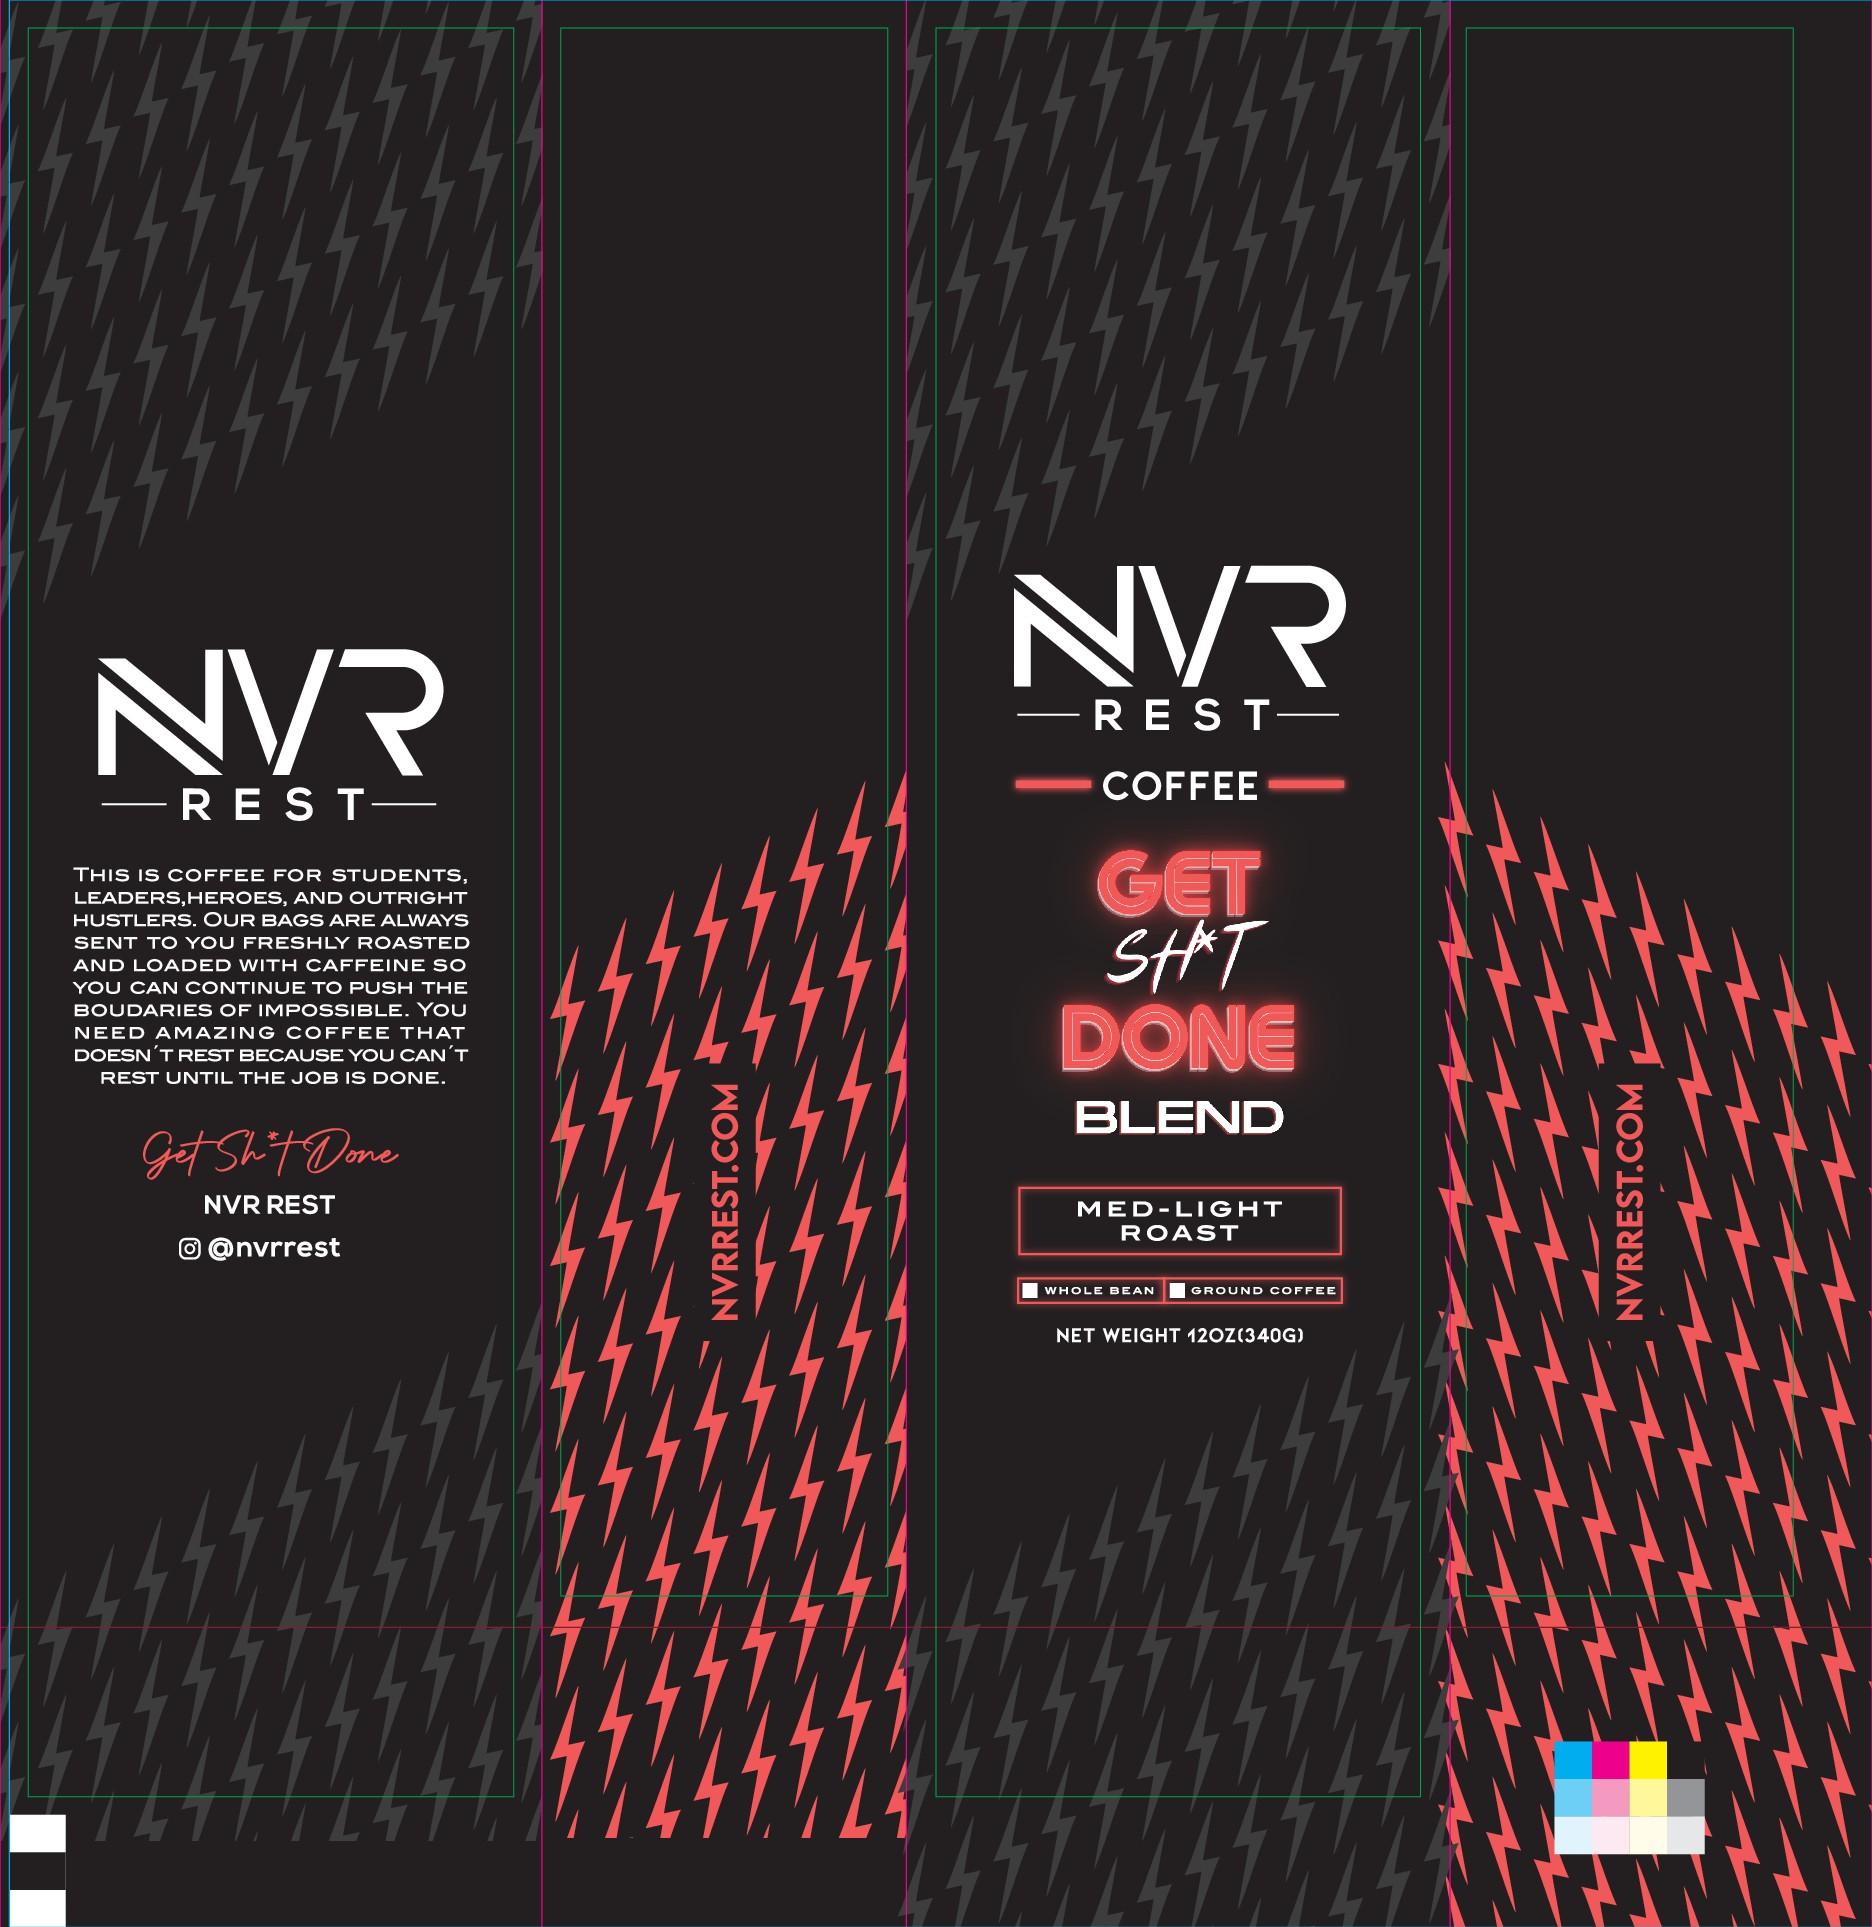 Modern Coffee Bag Design - NVR REST Coffee Co.